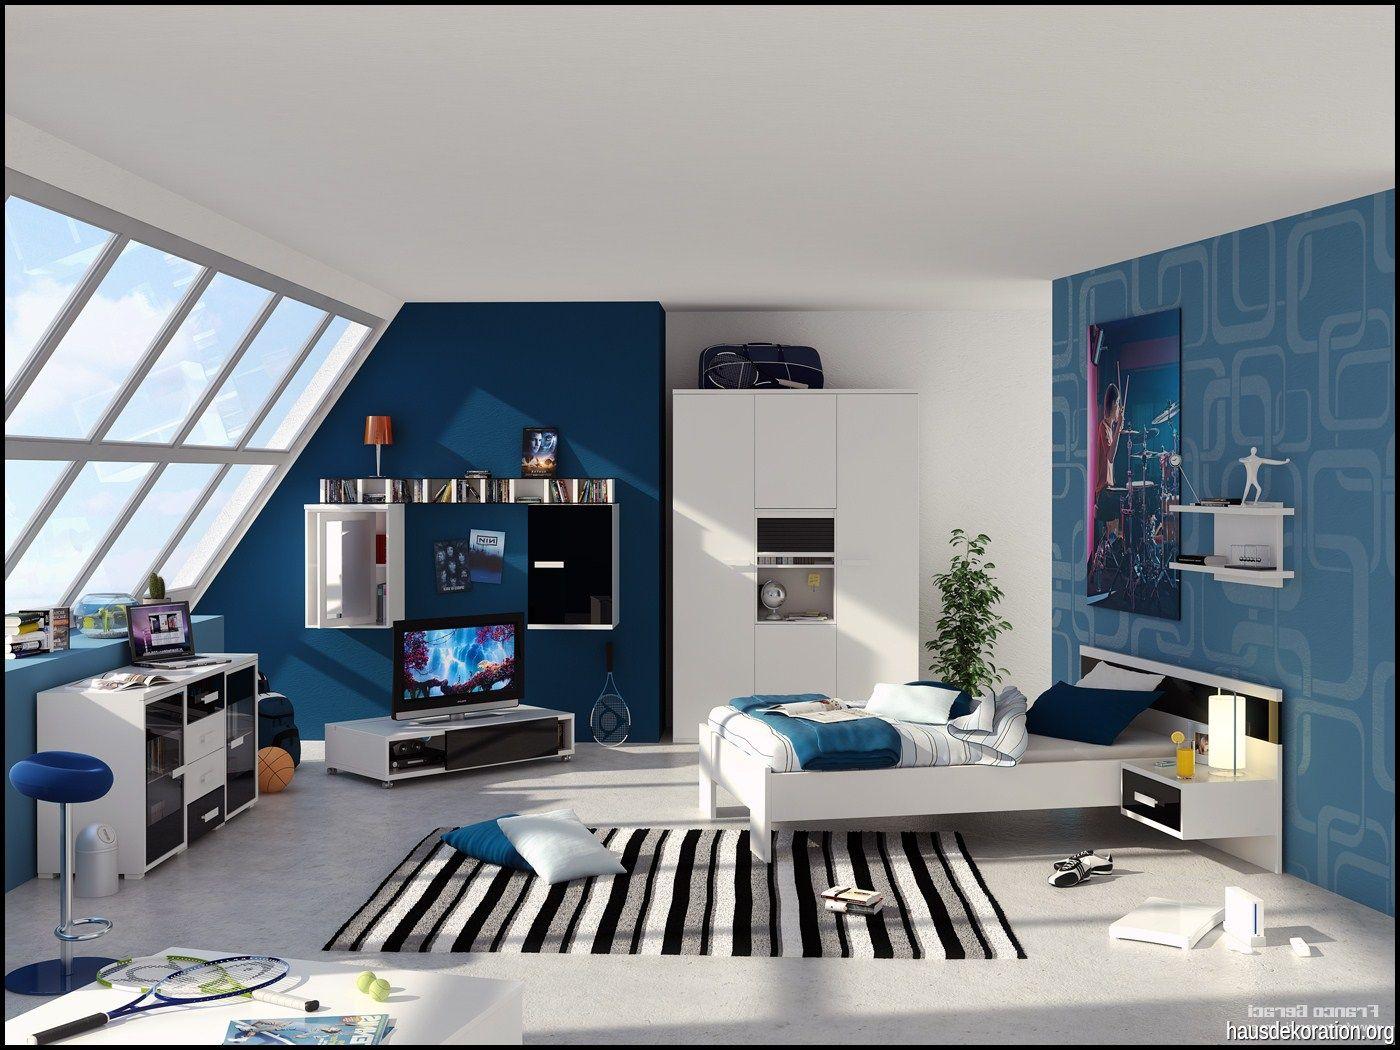 Einfaches hausfensterdesign jungen zimmer  top themen jungen schlafzimmer dekoideen jungen